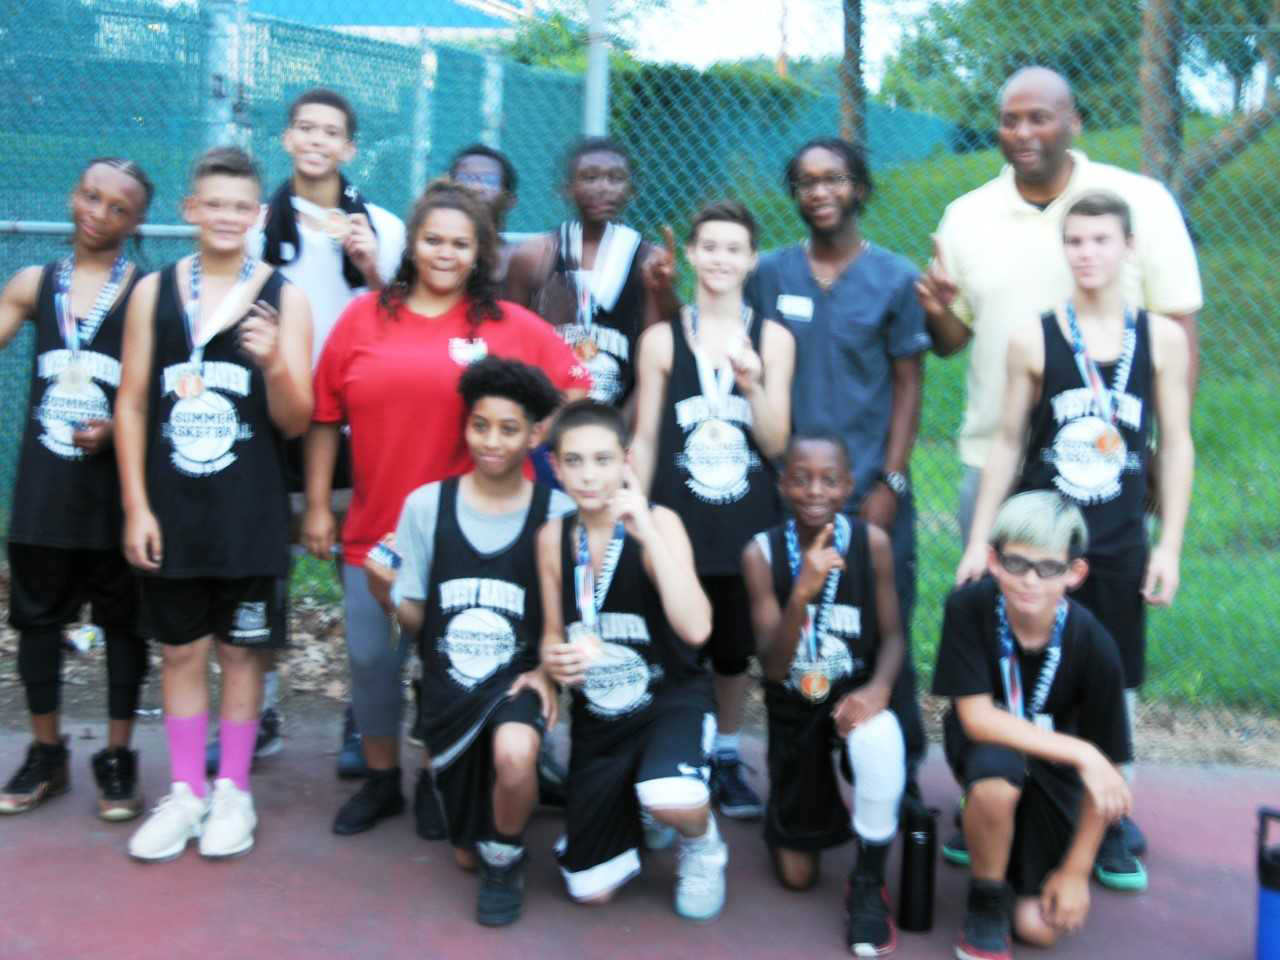 Summer champs